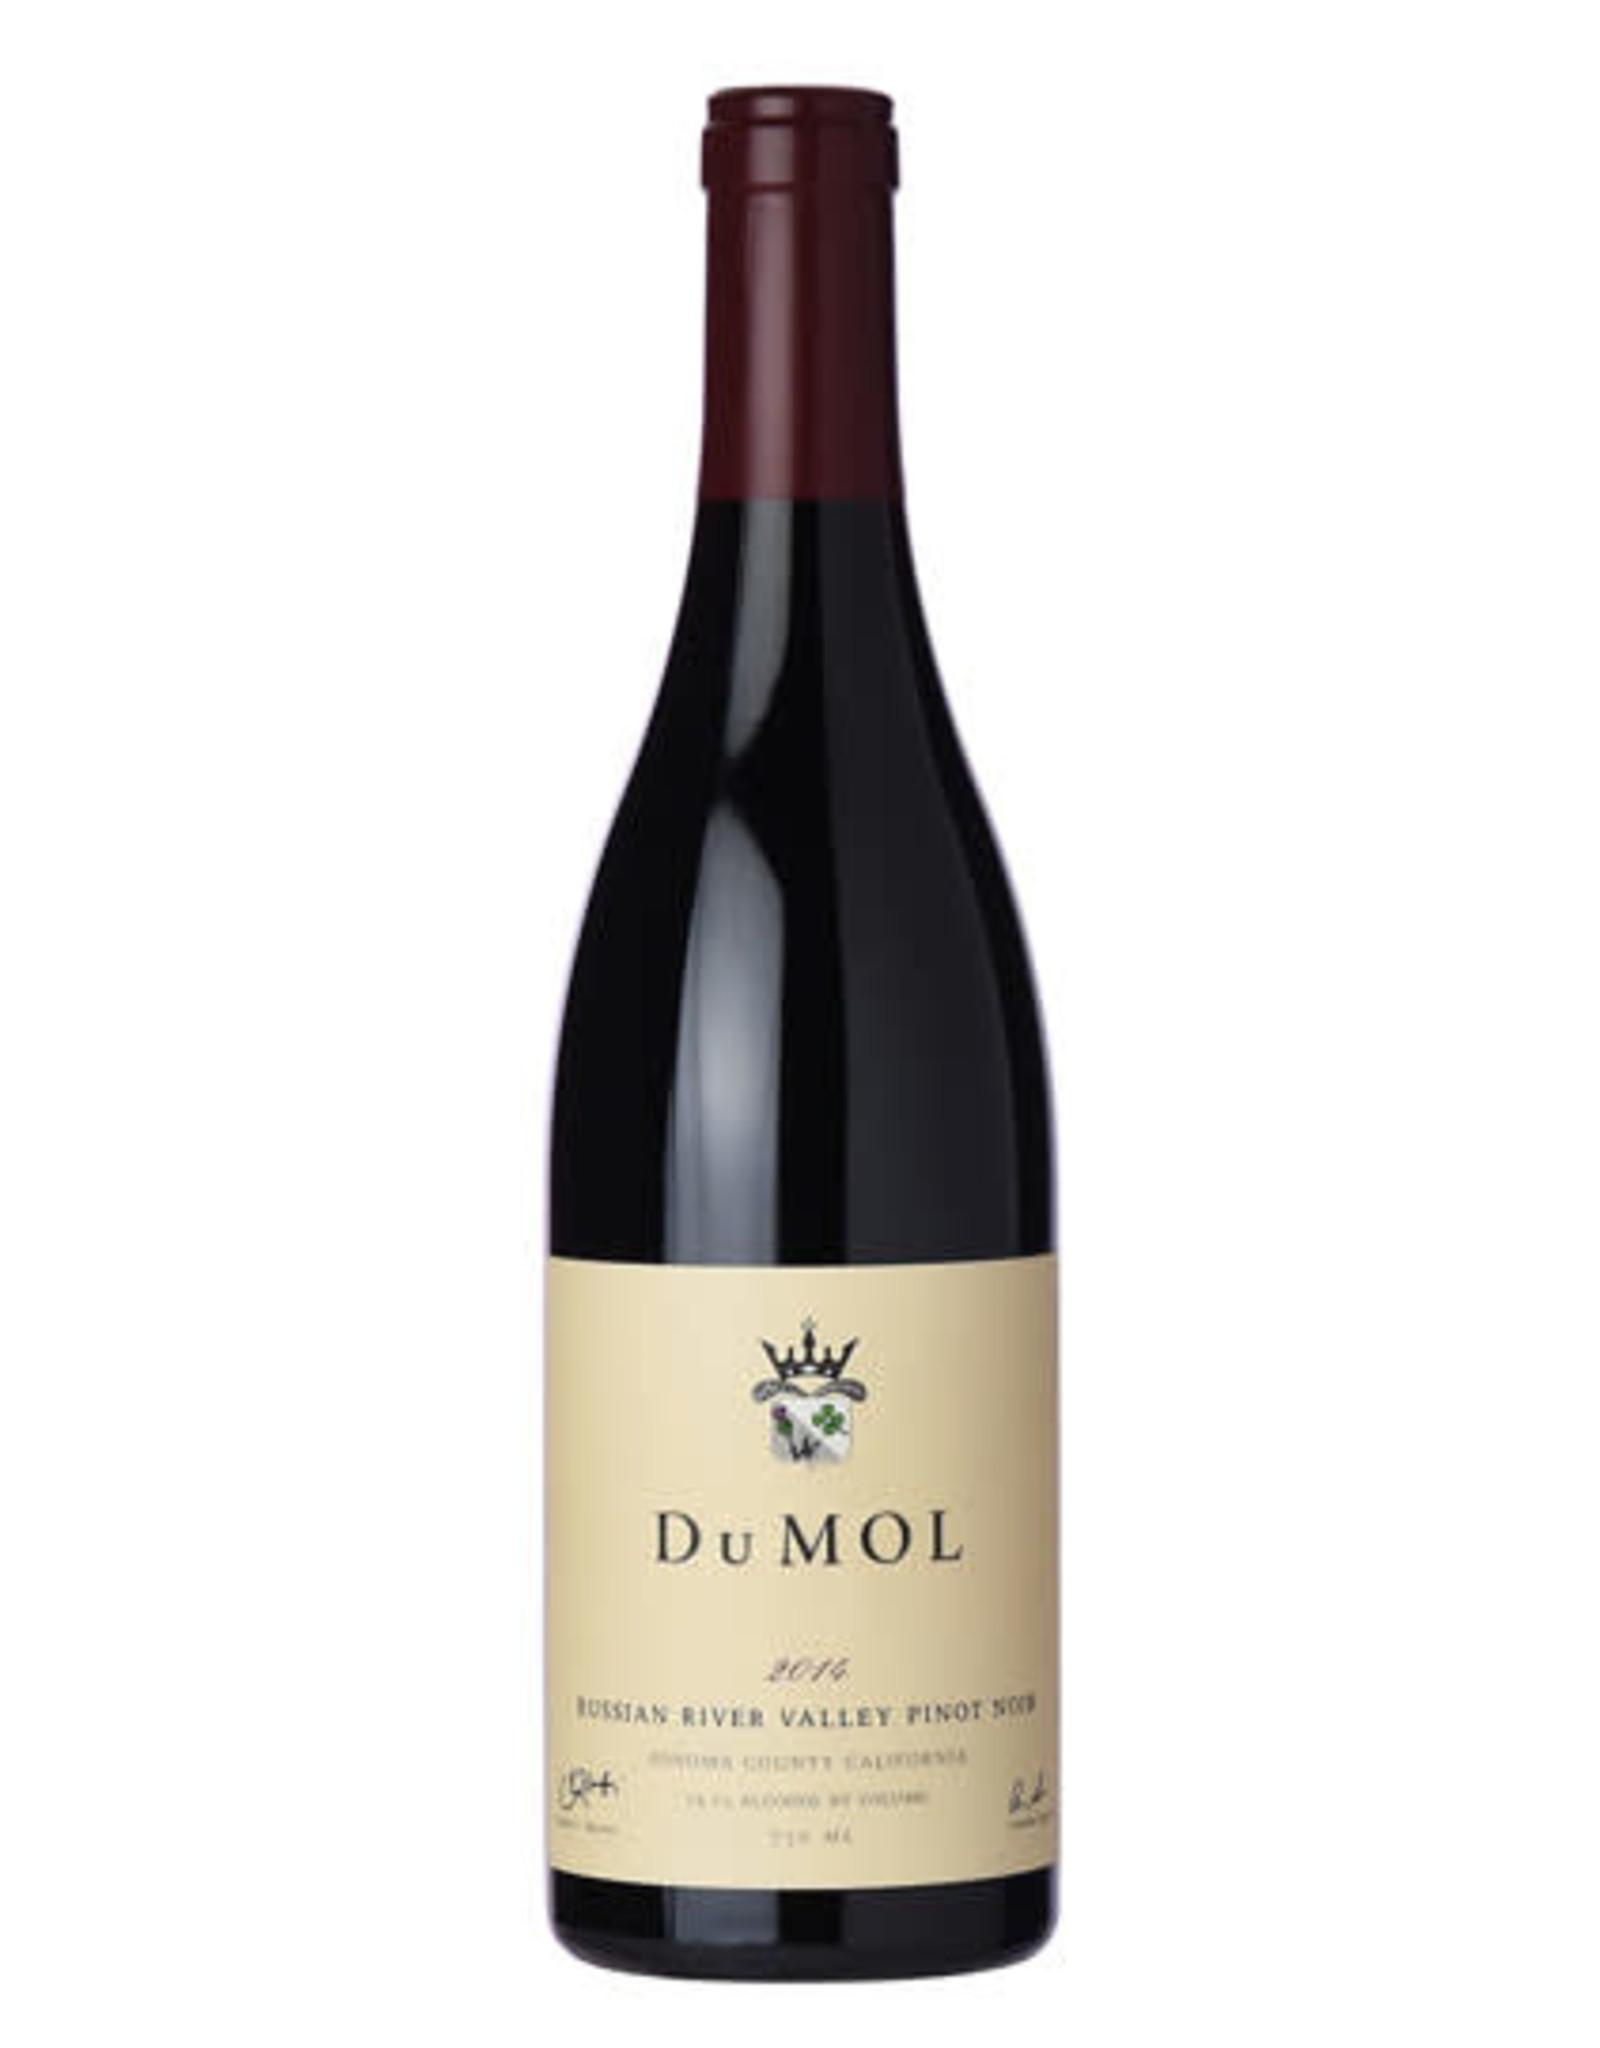 2014 DuMol Russian River Valley Pinot Noir